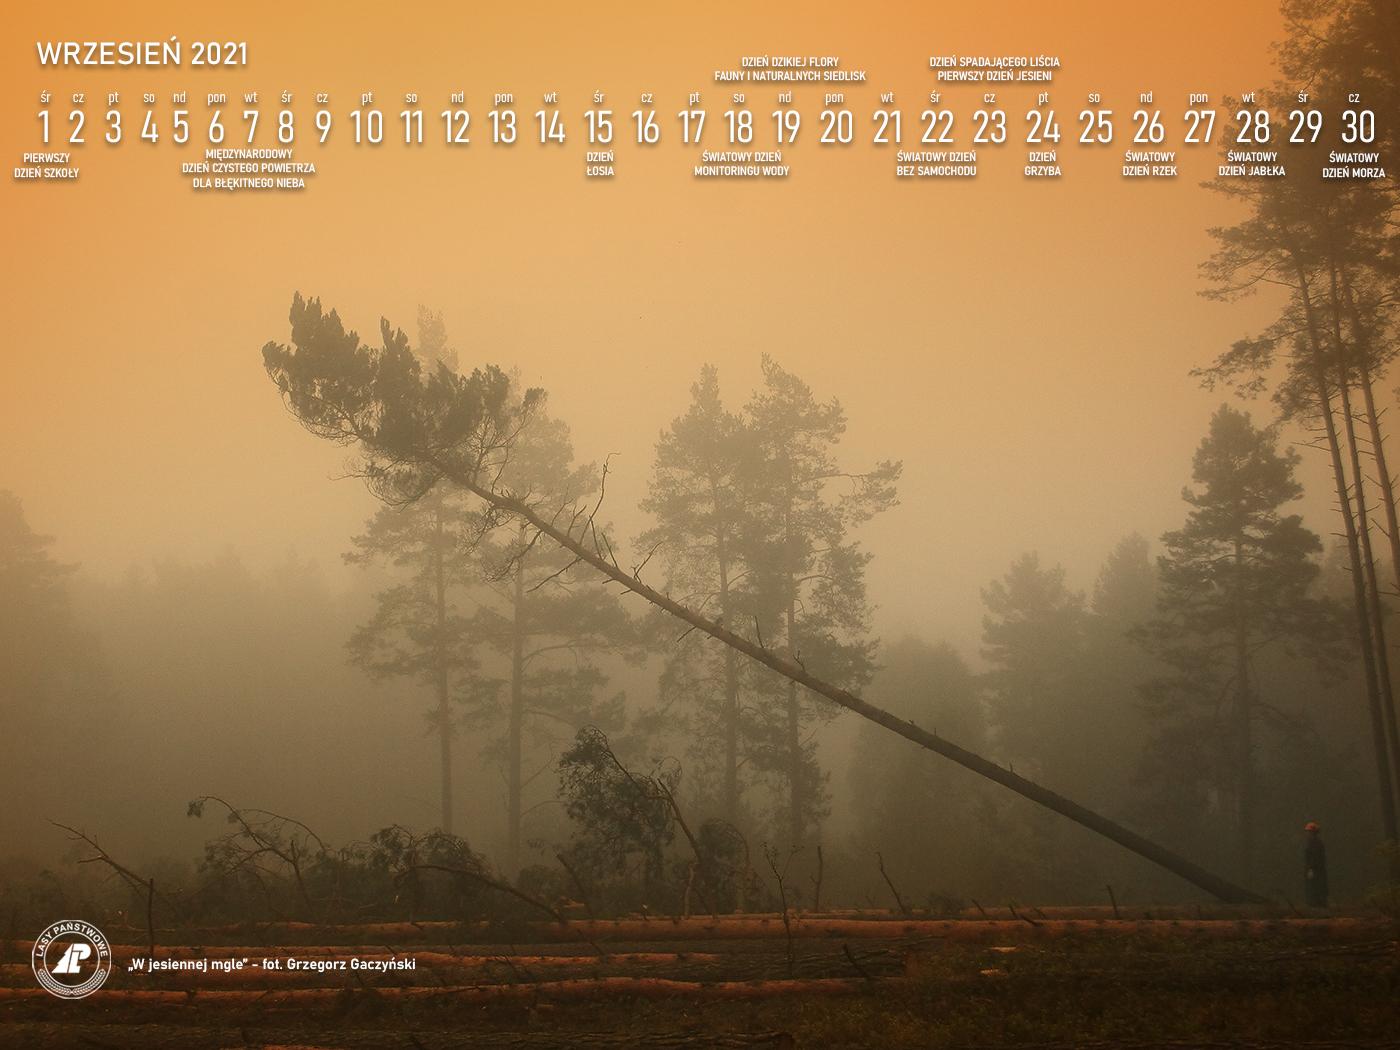 Kalendarz_wrzesień_2021_1400x1050[1].jpg